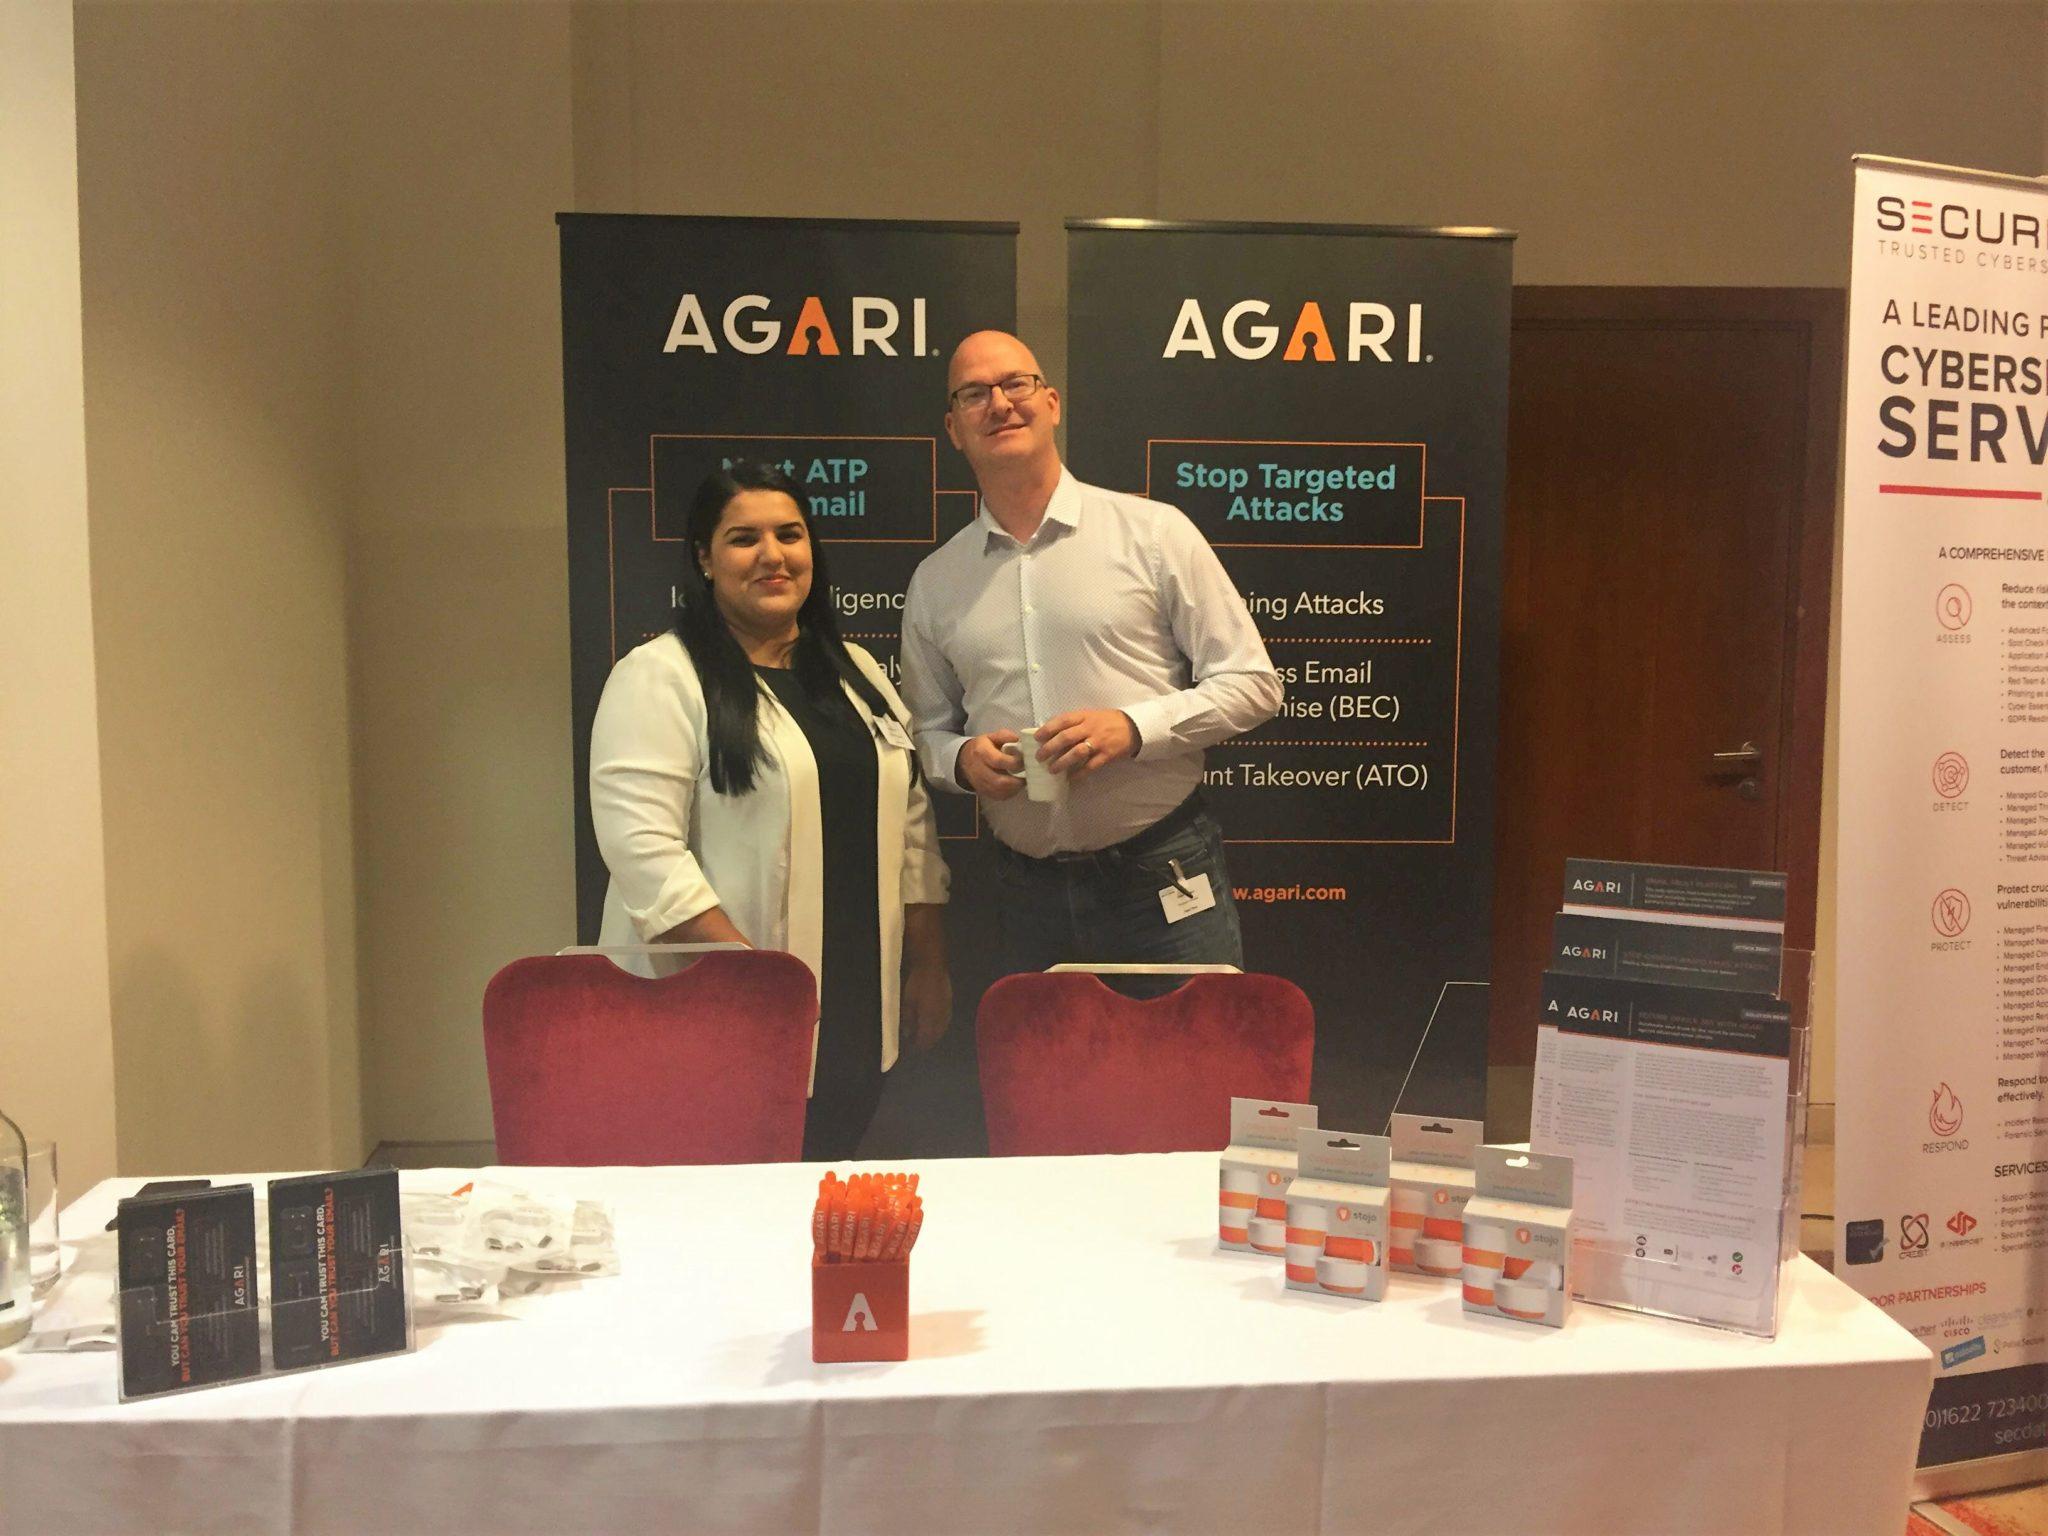 David and Agari at Securing Online Gaming Event.